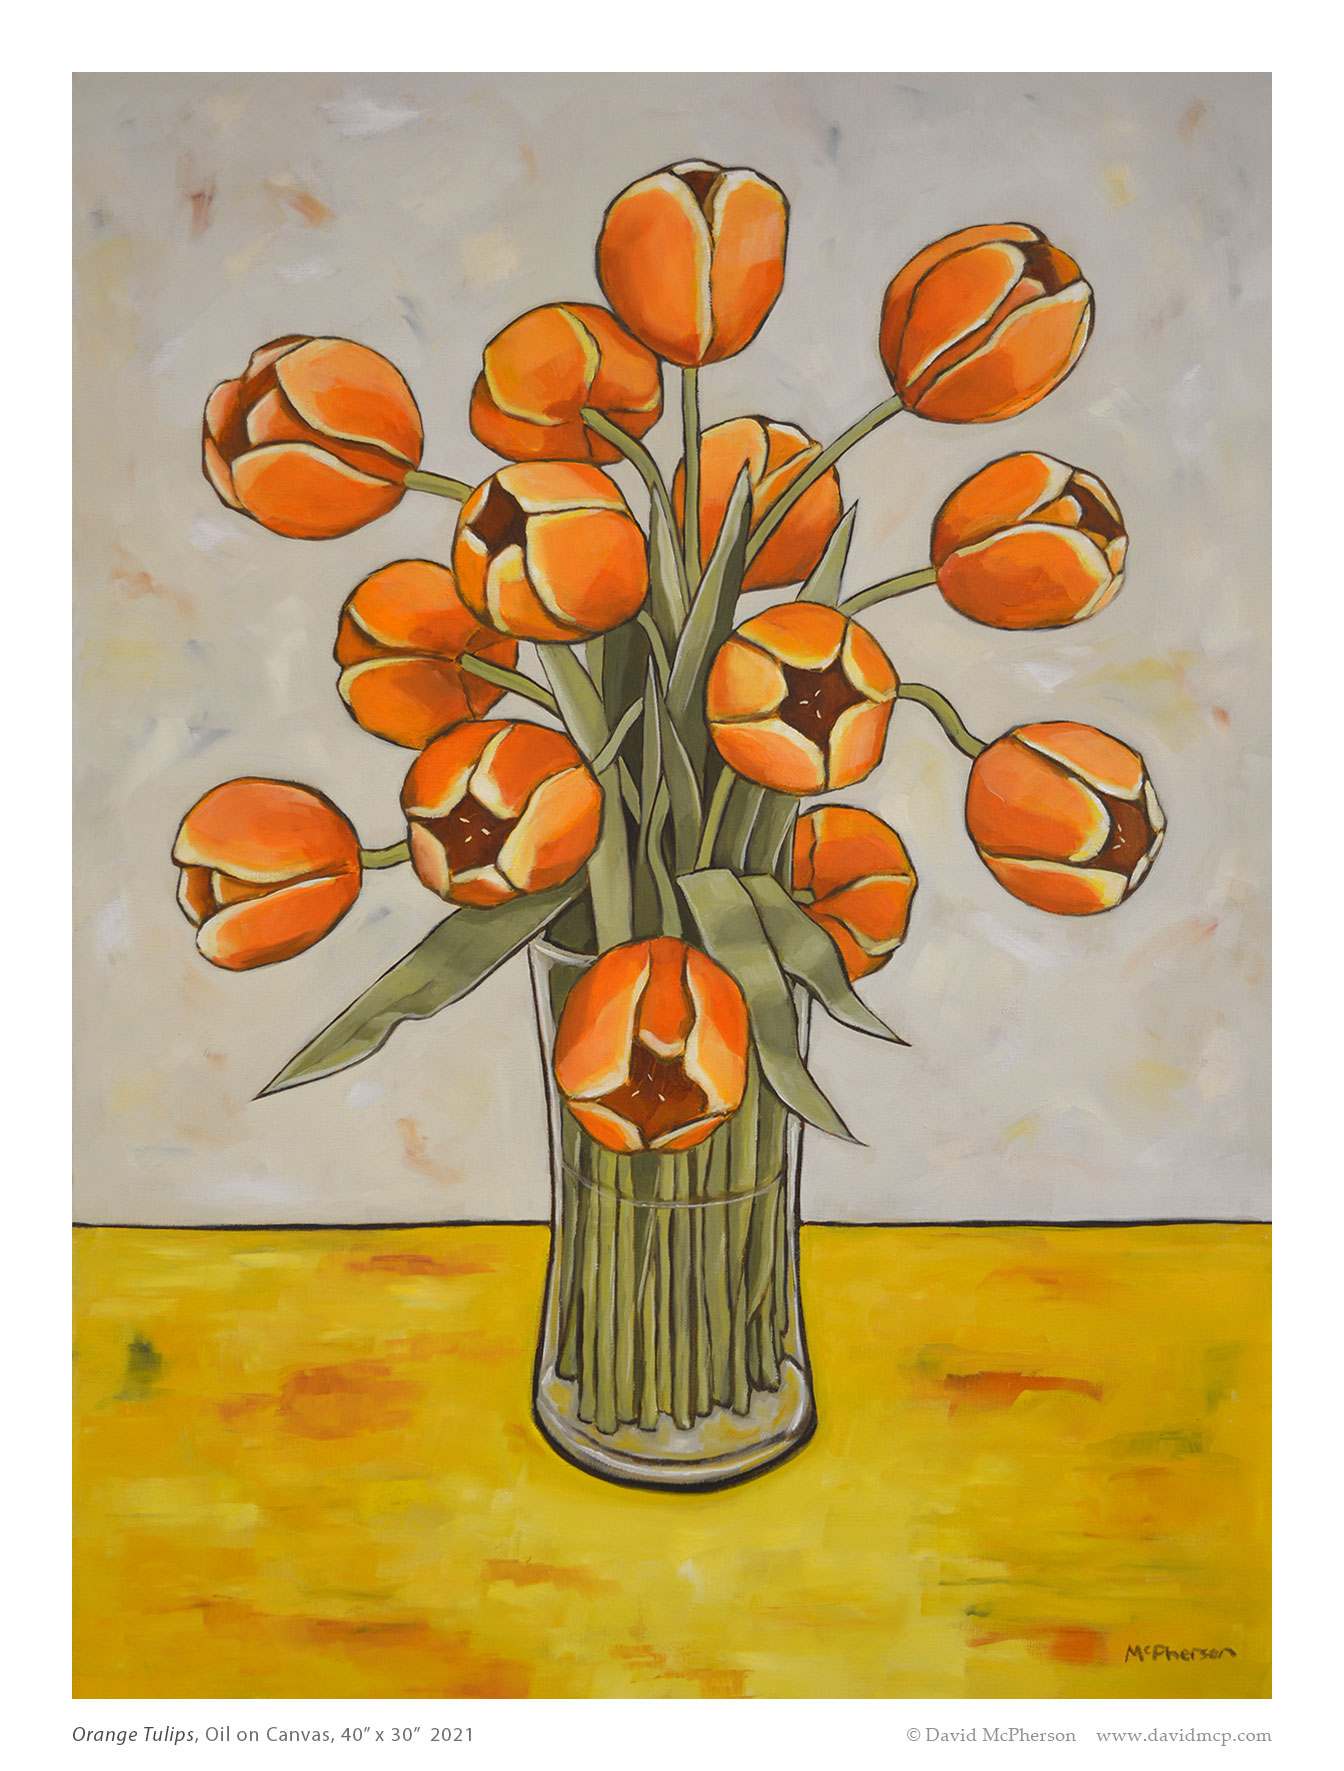 Orange Tulips, Oil on Canvas, 40 x 30, 2021, McPherson